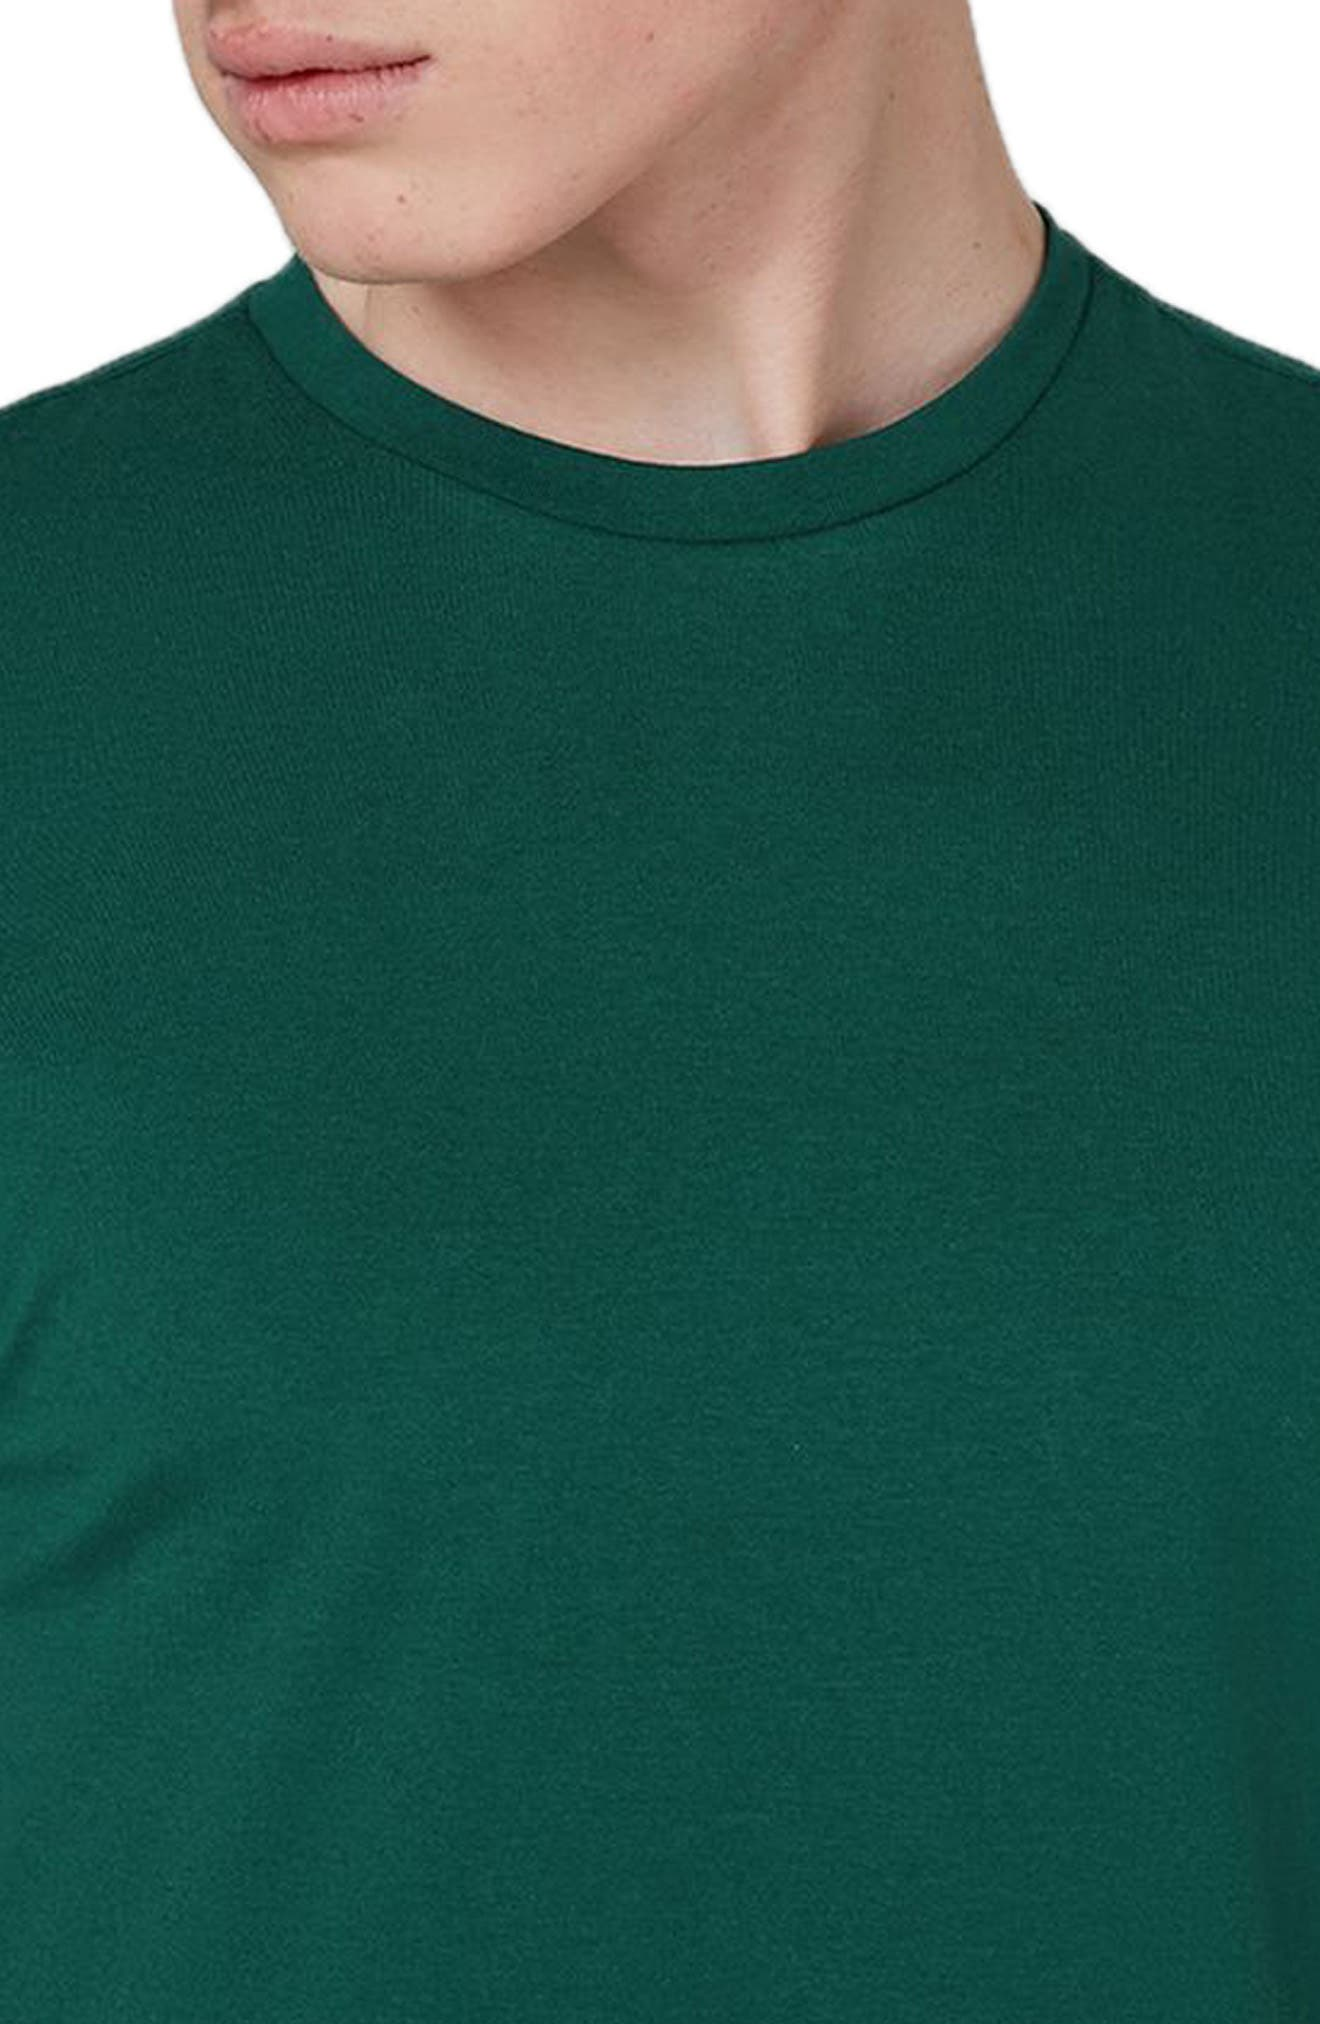 Slim Fit Crewneck T-Shirt,                             Alternate thumbnail 198, color,